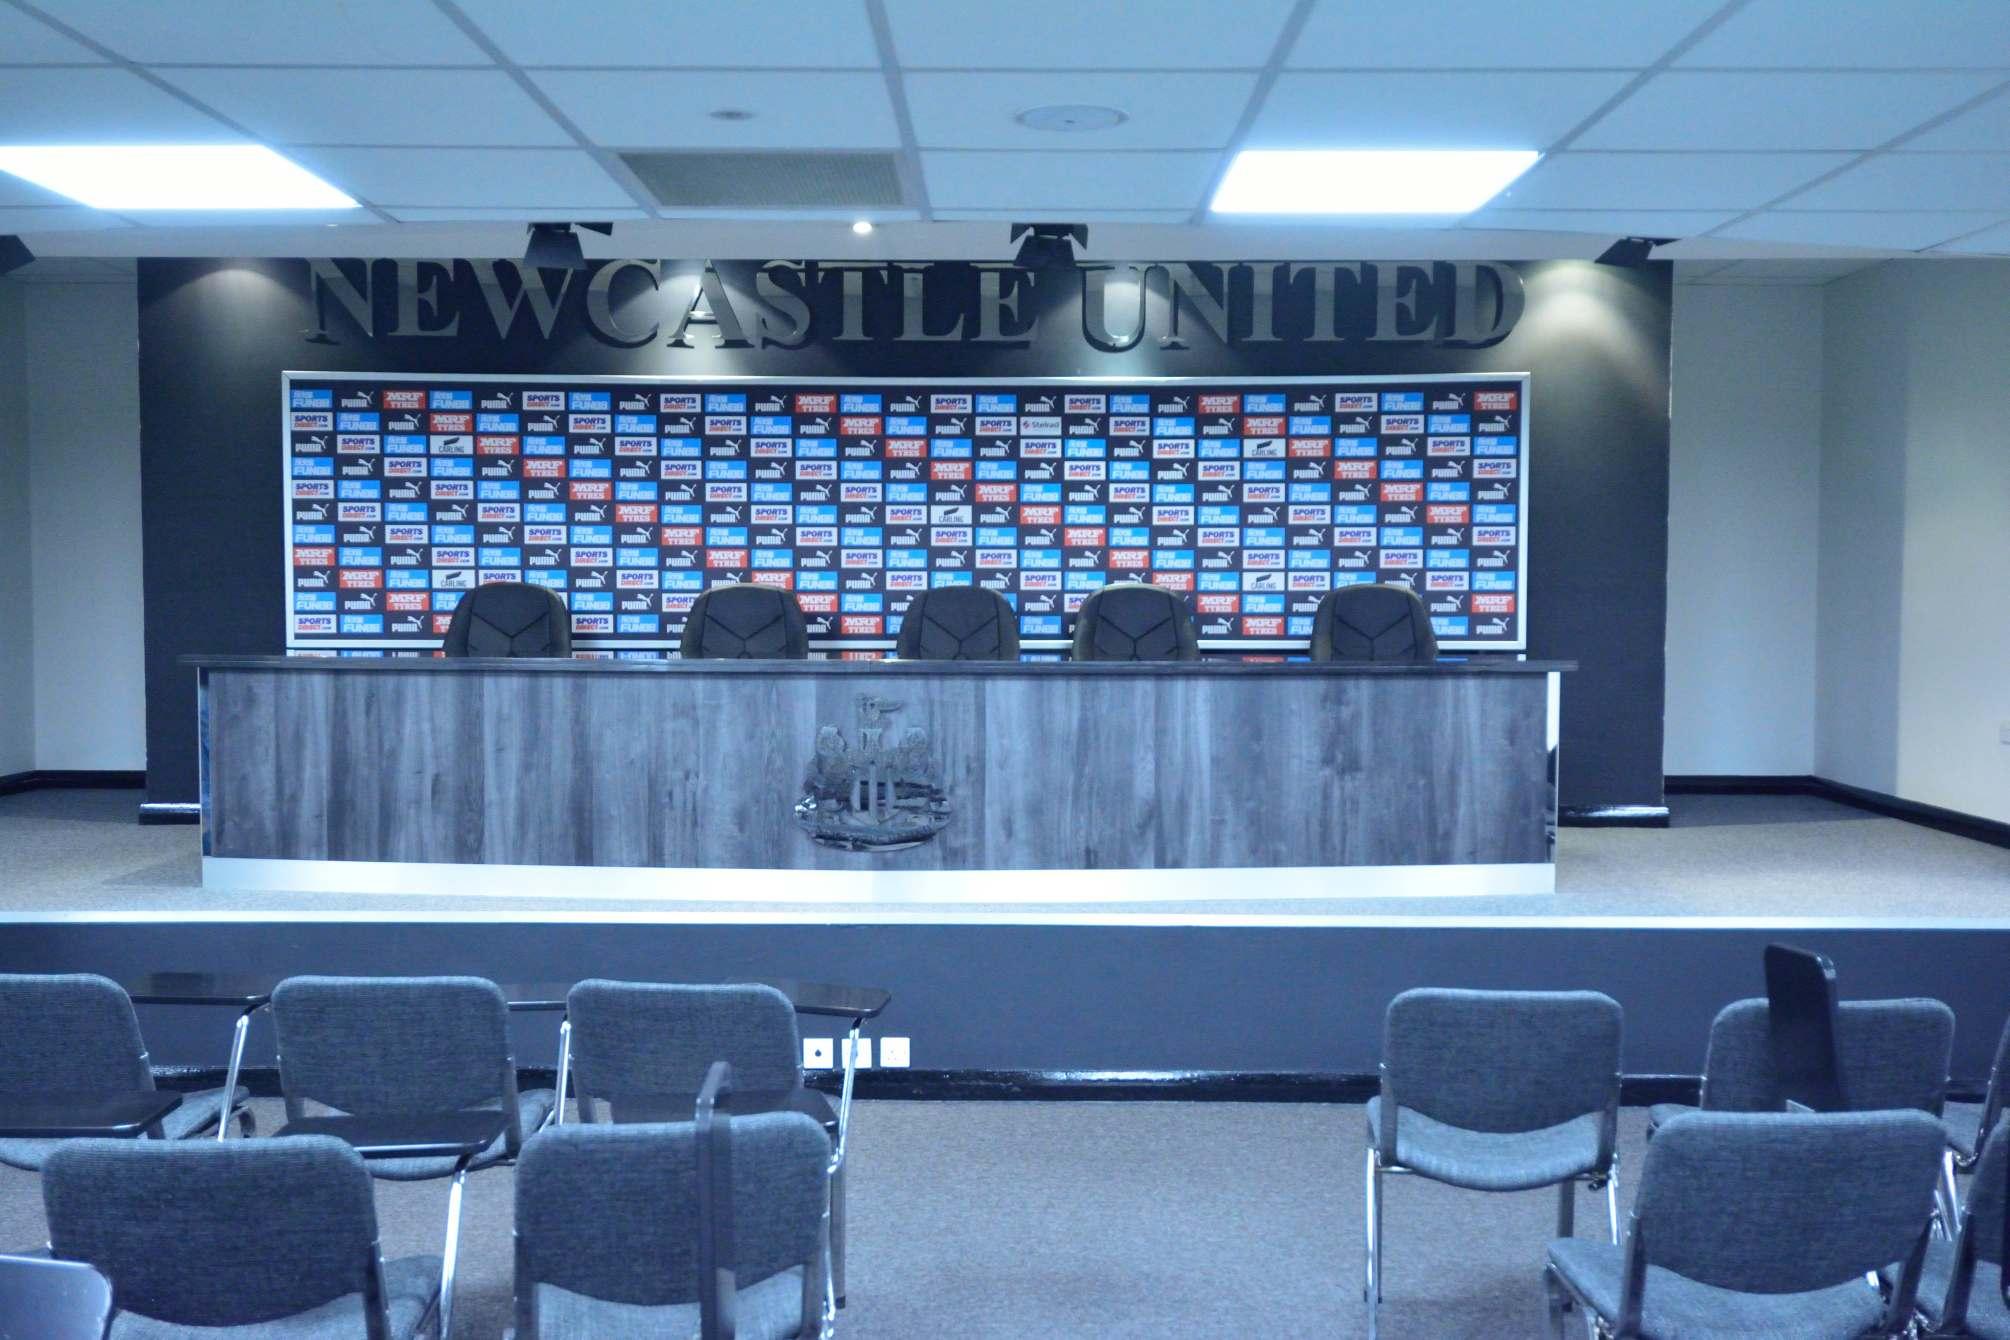 nufc tours13 Newcastle United Stadium Tours for Fans